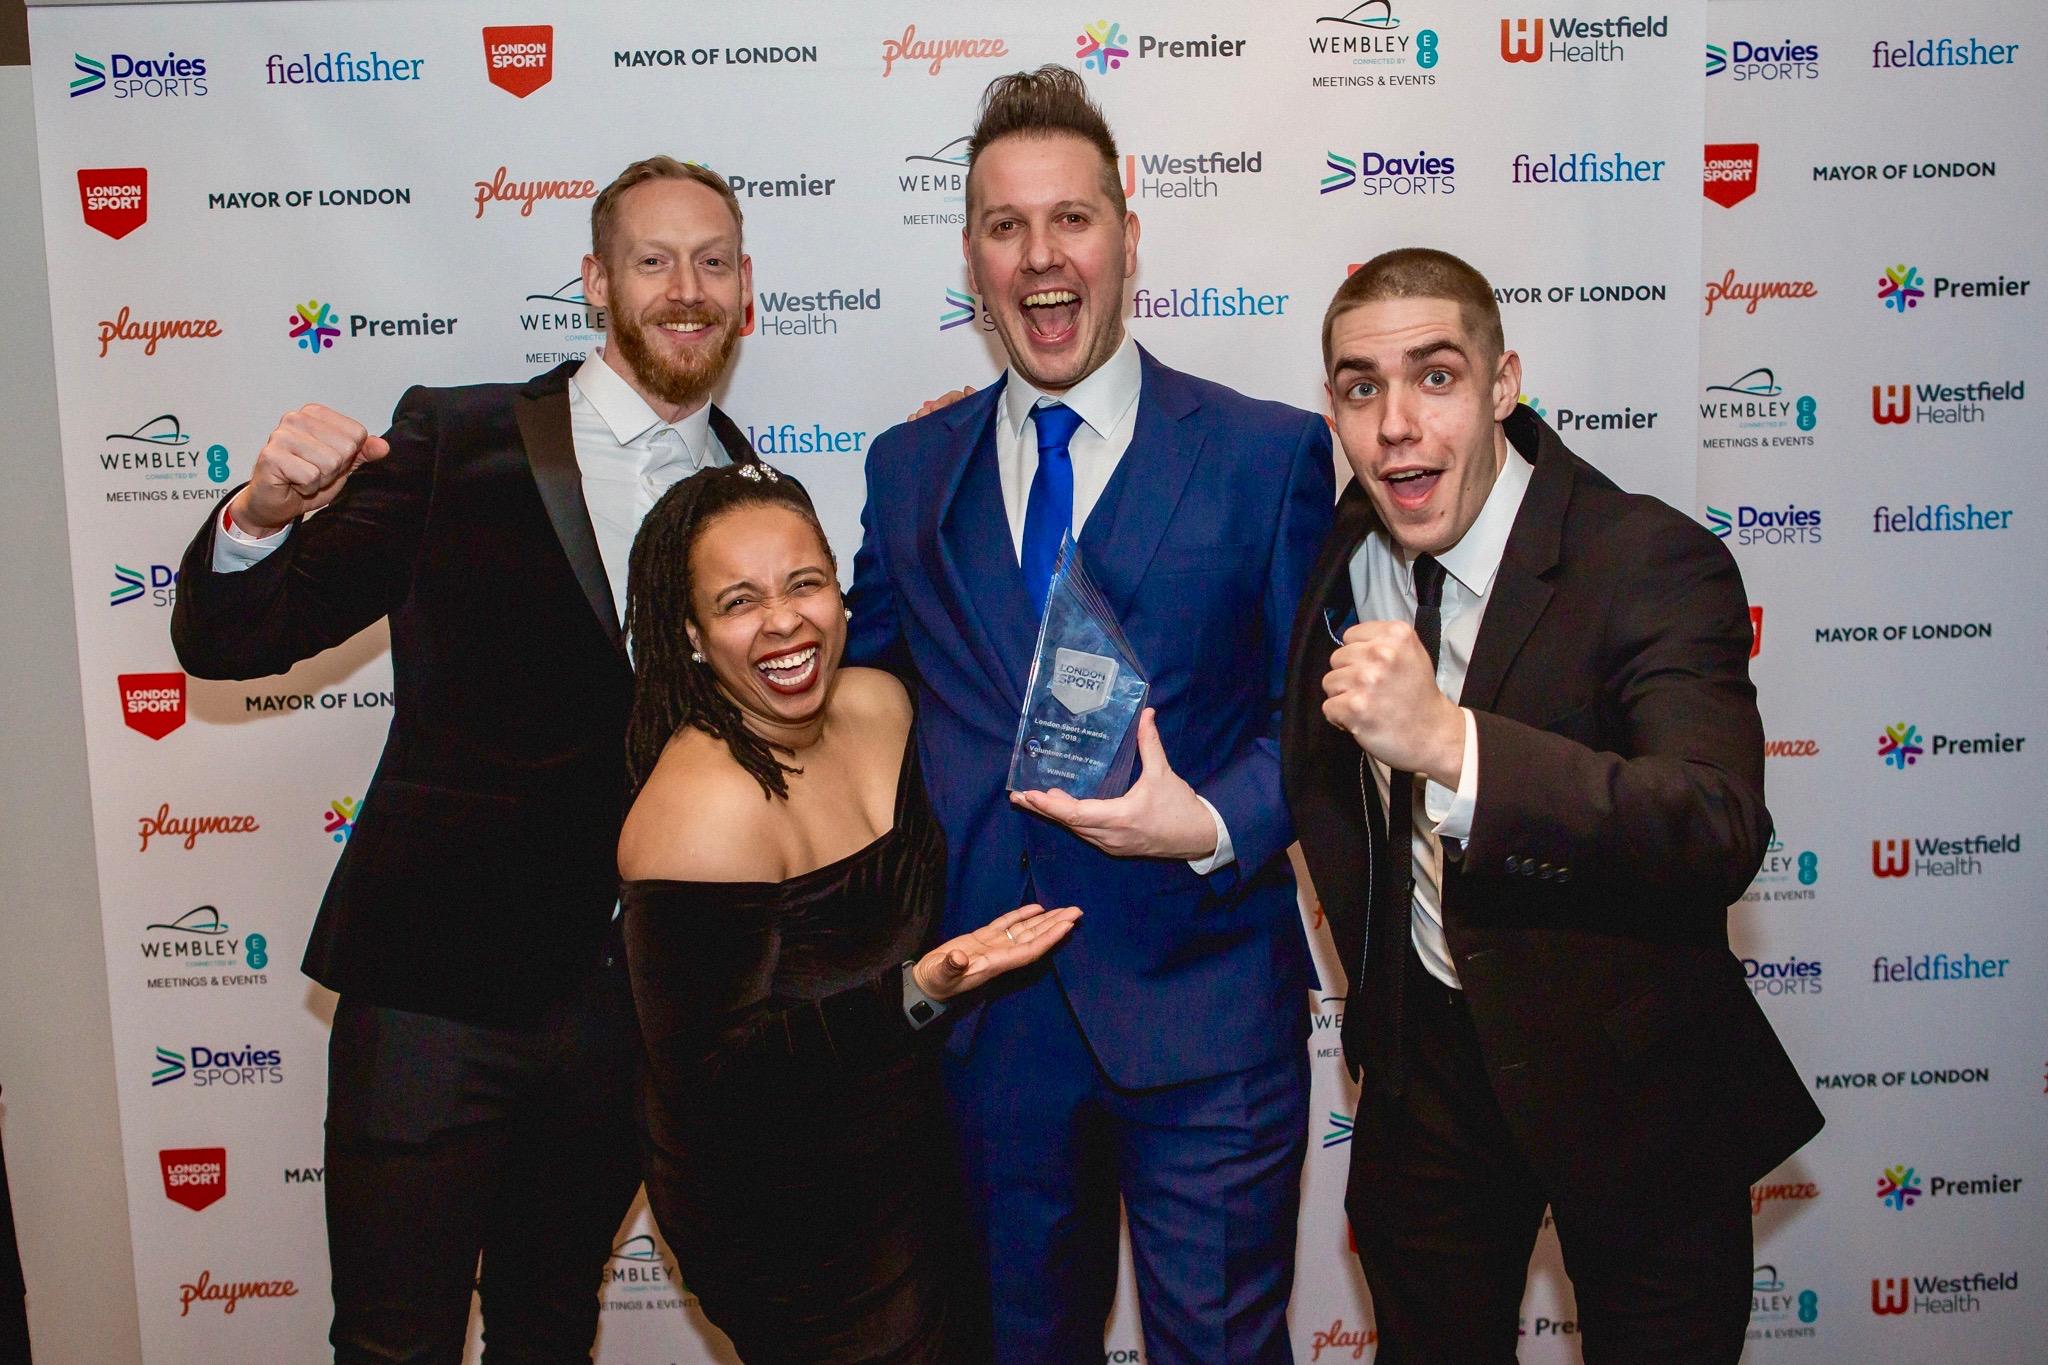 Winning the Volunteer of the Year award